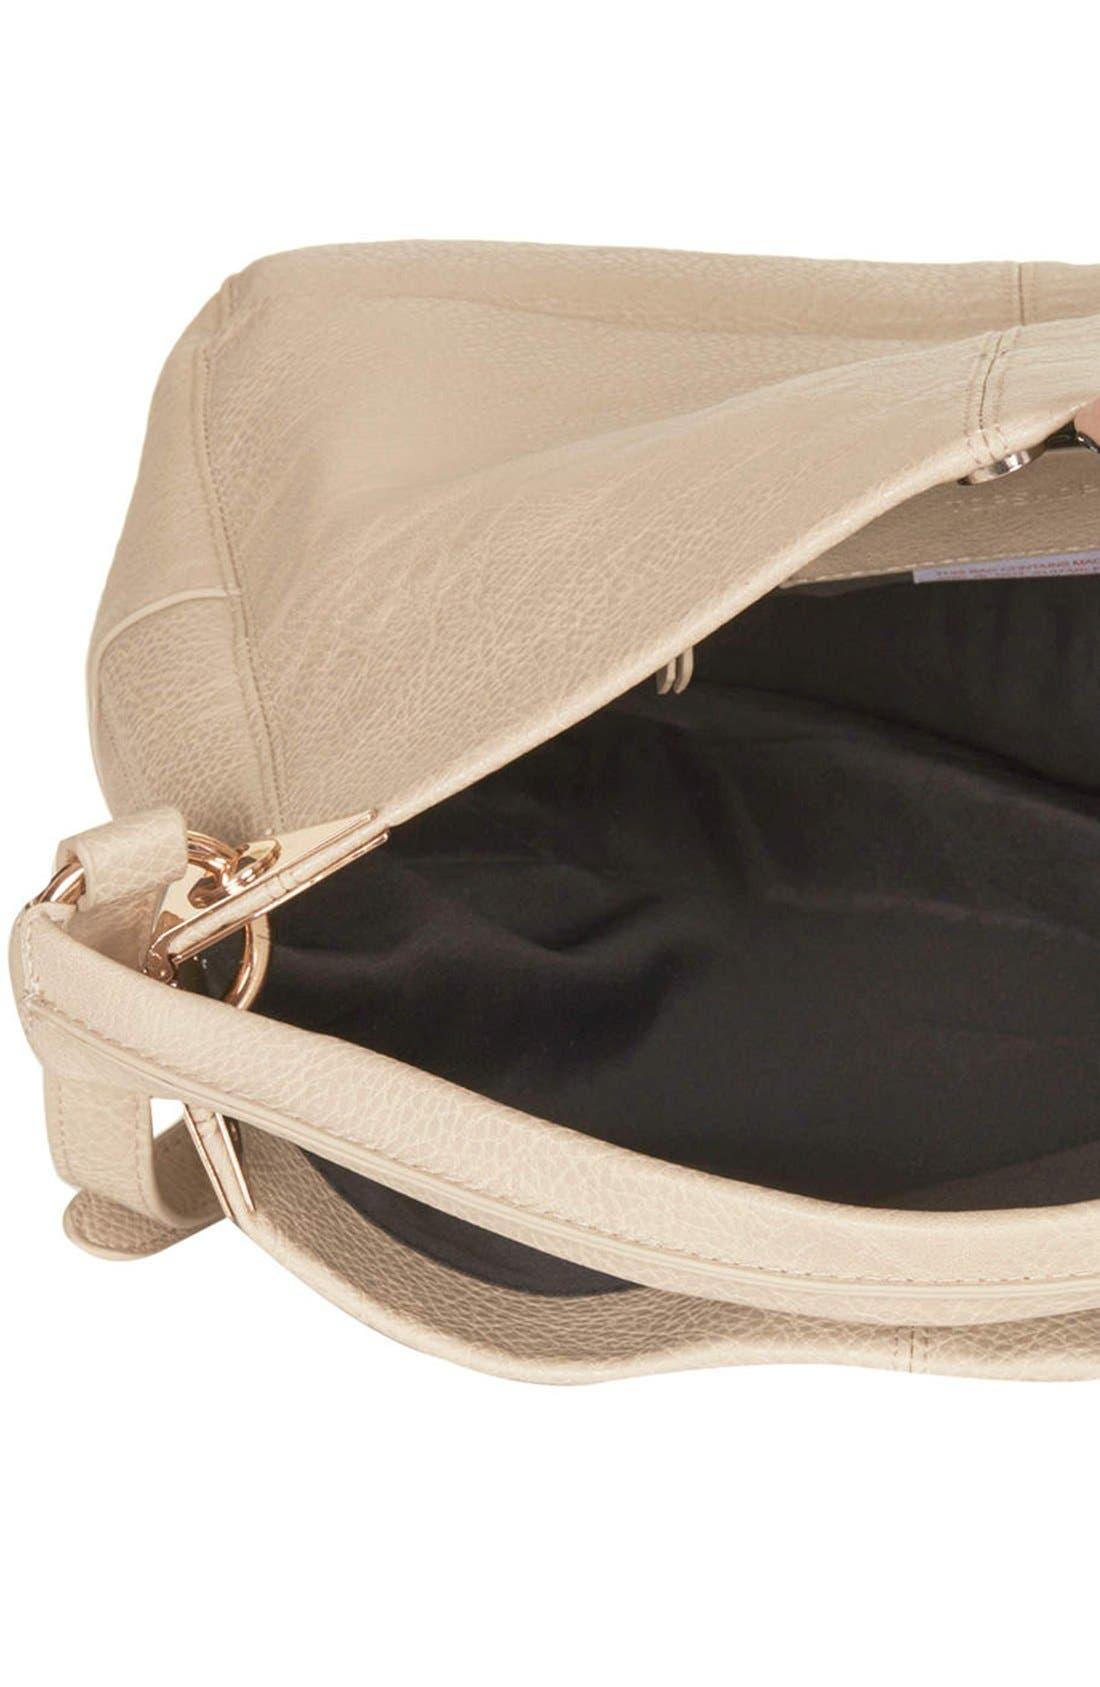 Alternate Image 3  - Topshop Faux Leather Hobo Bag